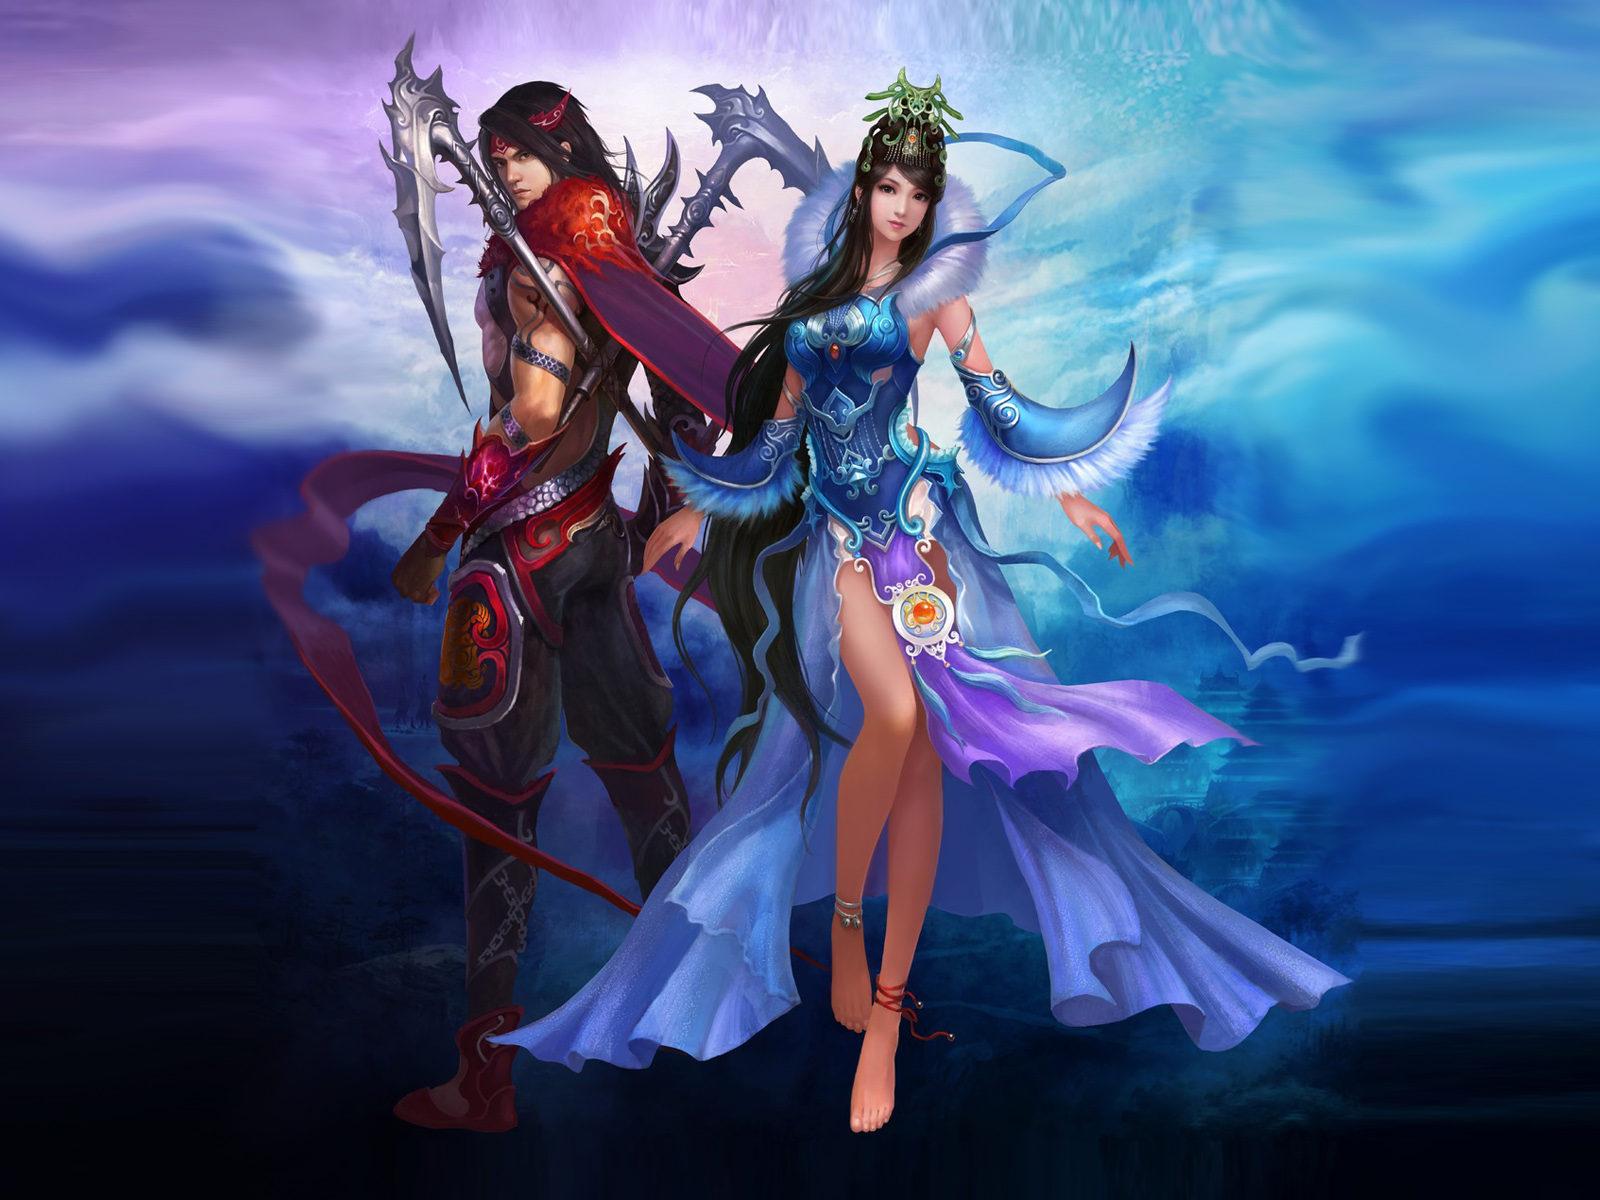 Girls Breast Wallpaper Jade Dynasty Video Game Desktop Wallpaper Hd Resolution